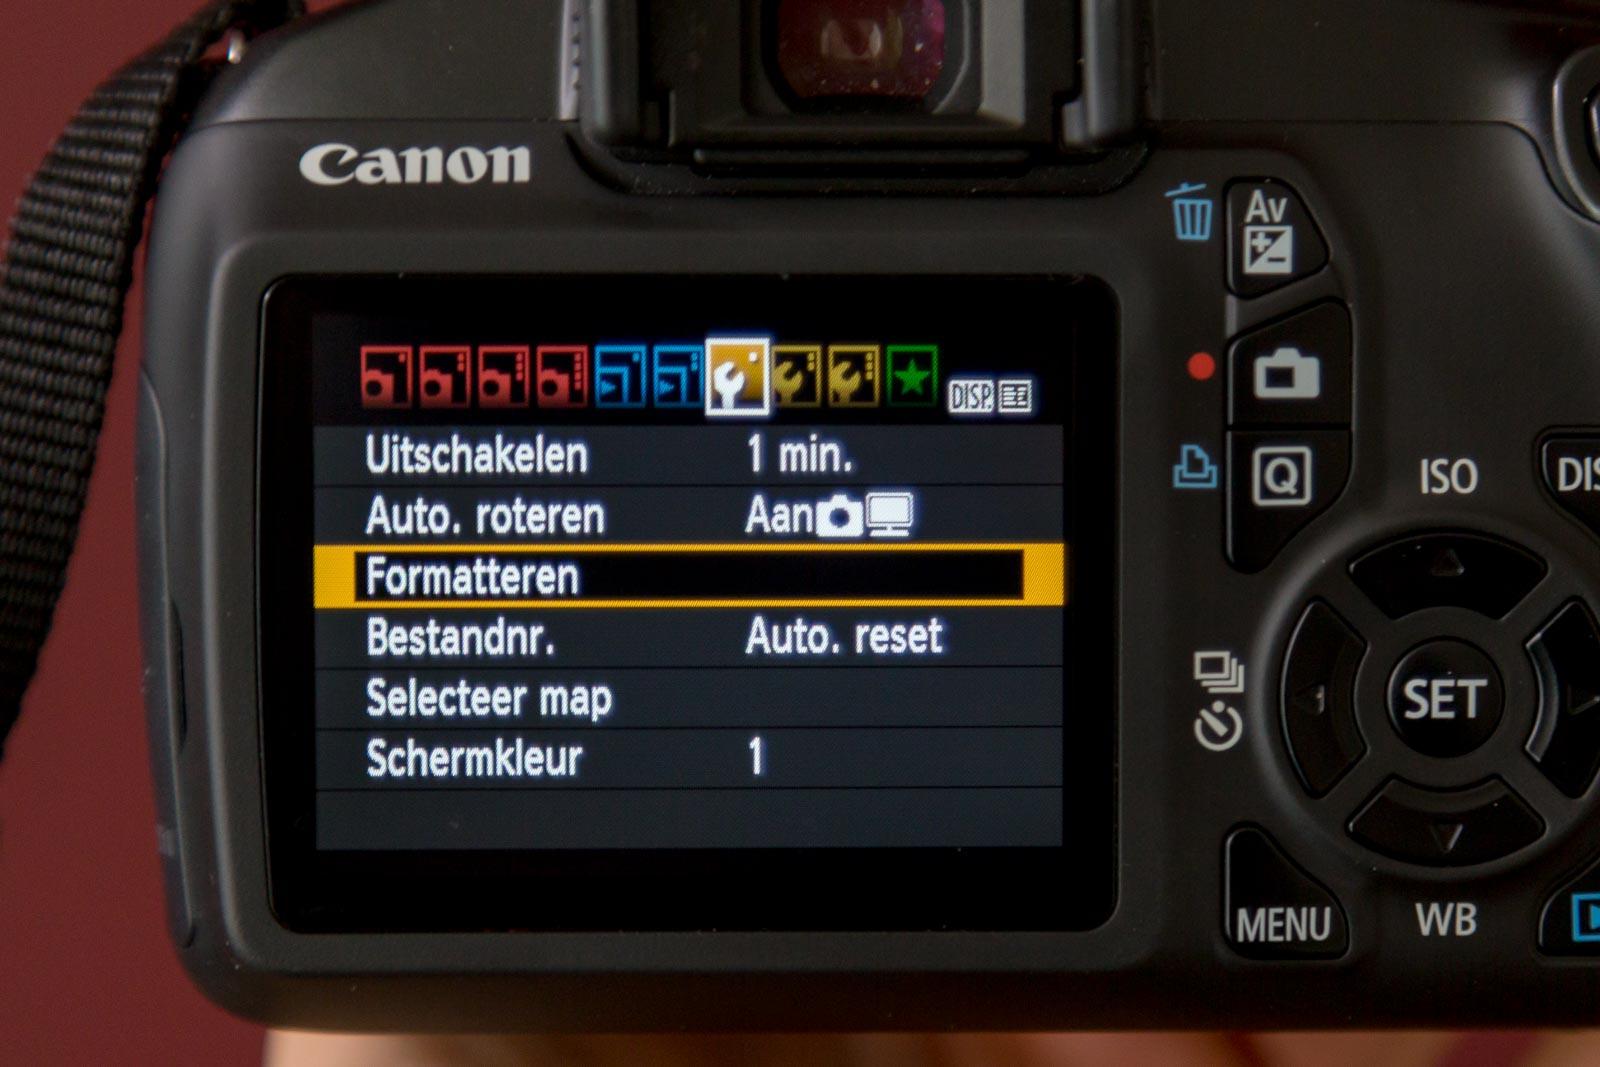 Canon menu optie formatteren